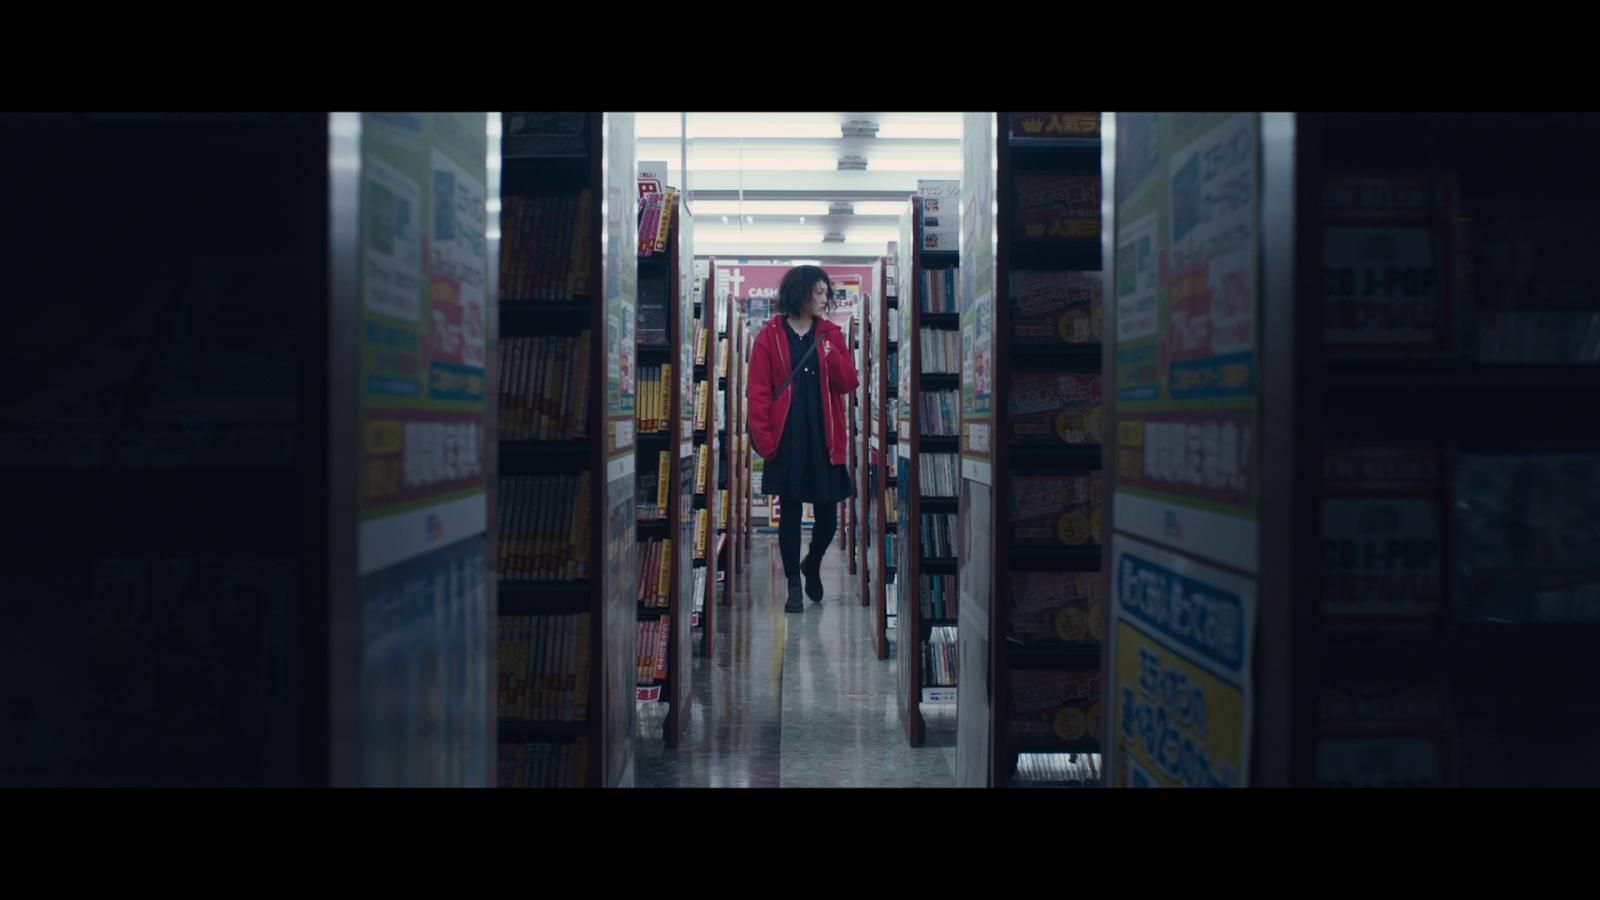 Kumiko The Treasure Hunter (2014) 1080p BD25 5